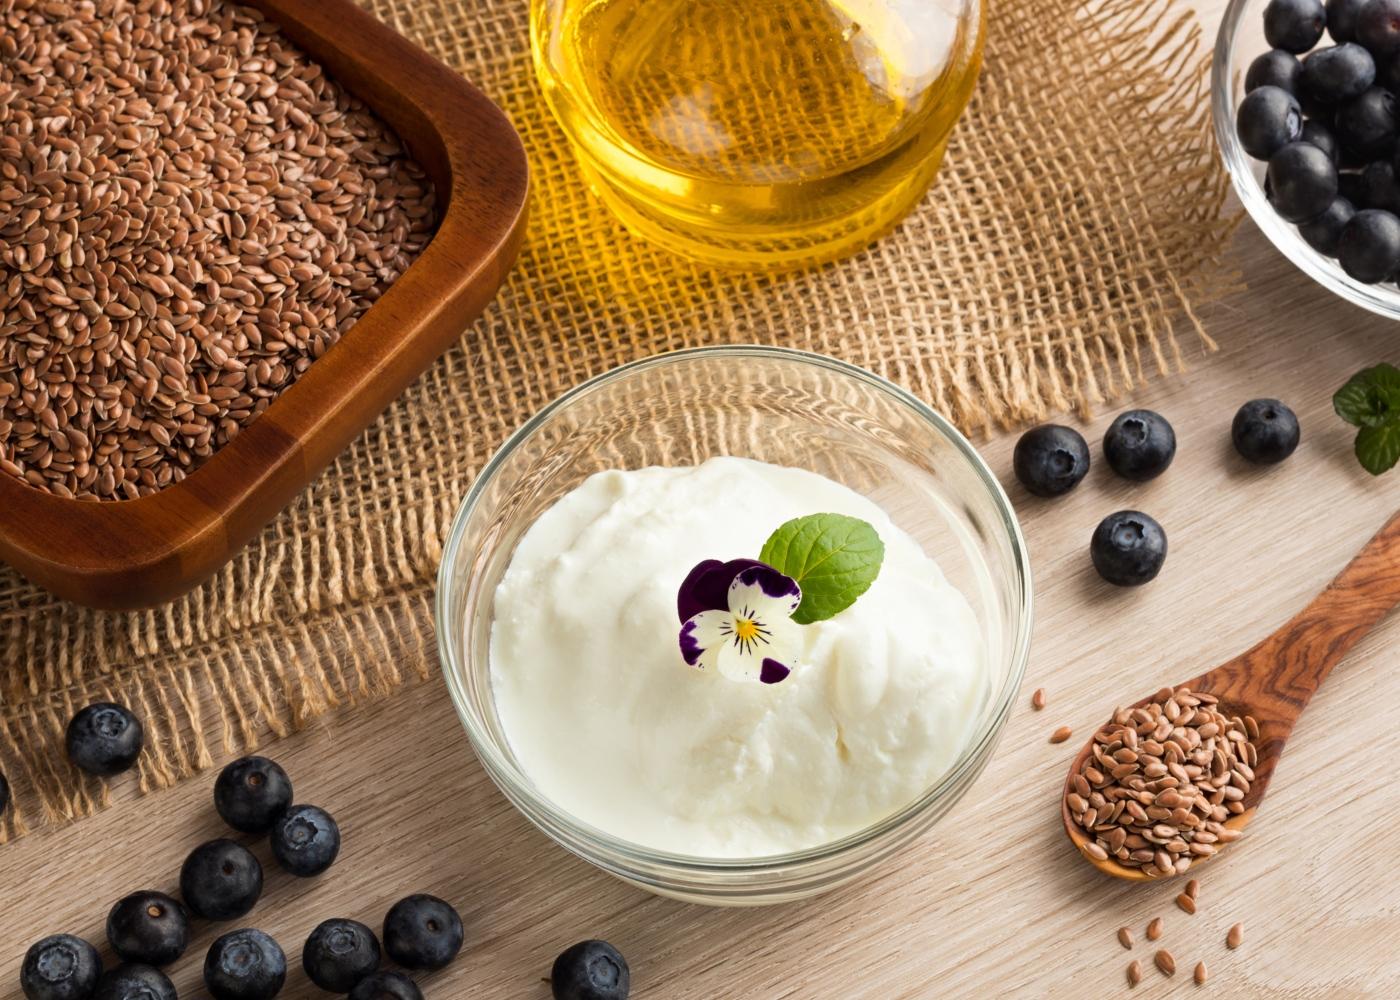 Queijo quark, mirtilos e sementes em cima de mesa